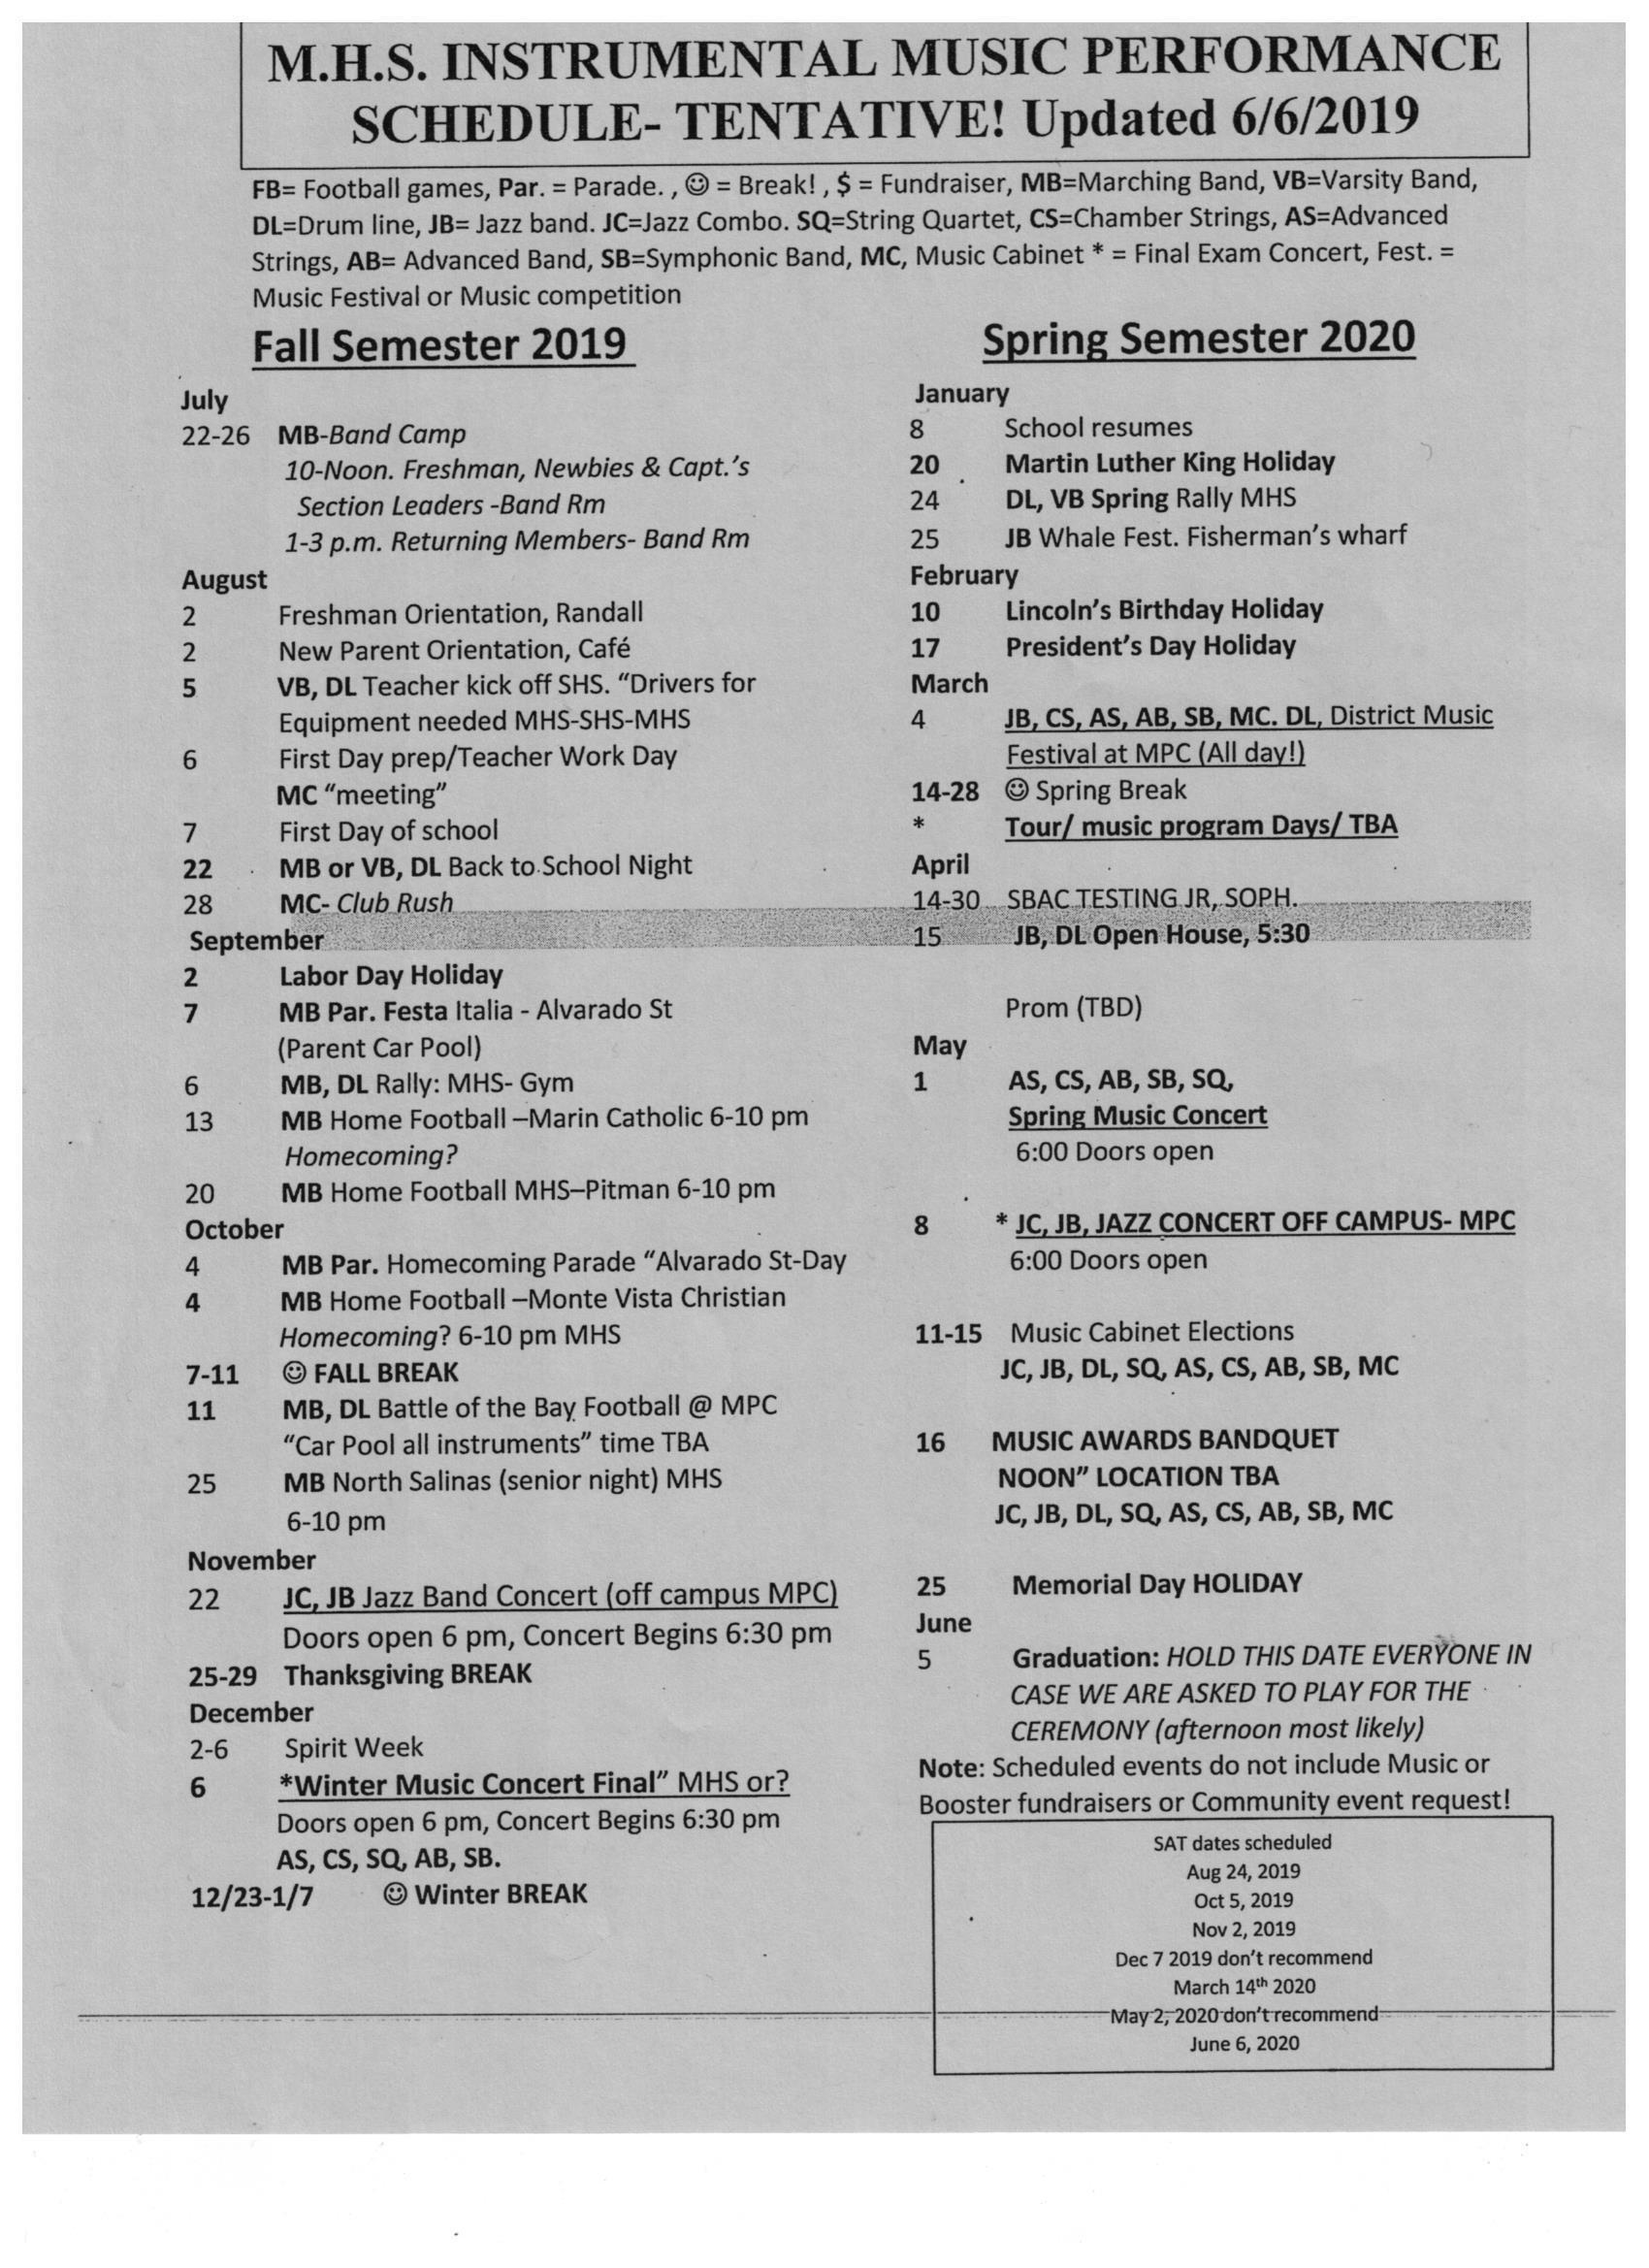 Tentative Music Performance Schedule